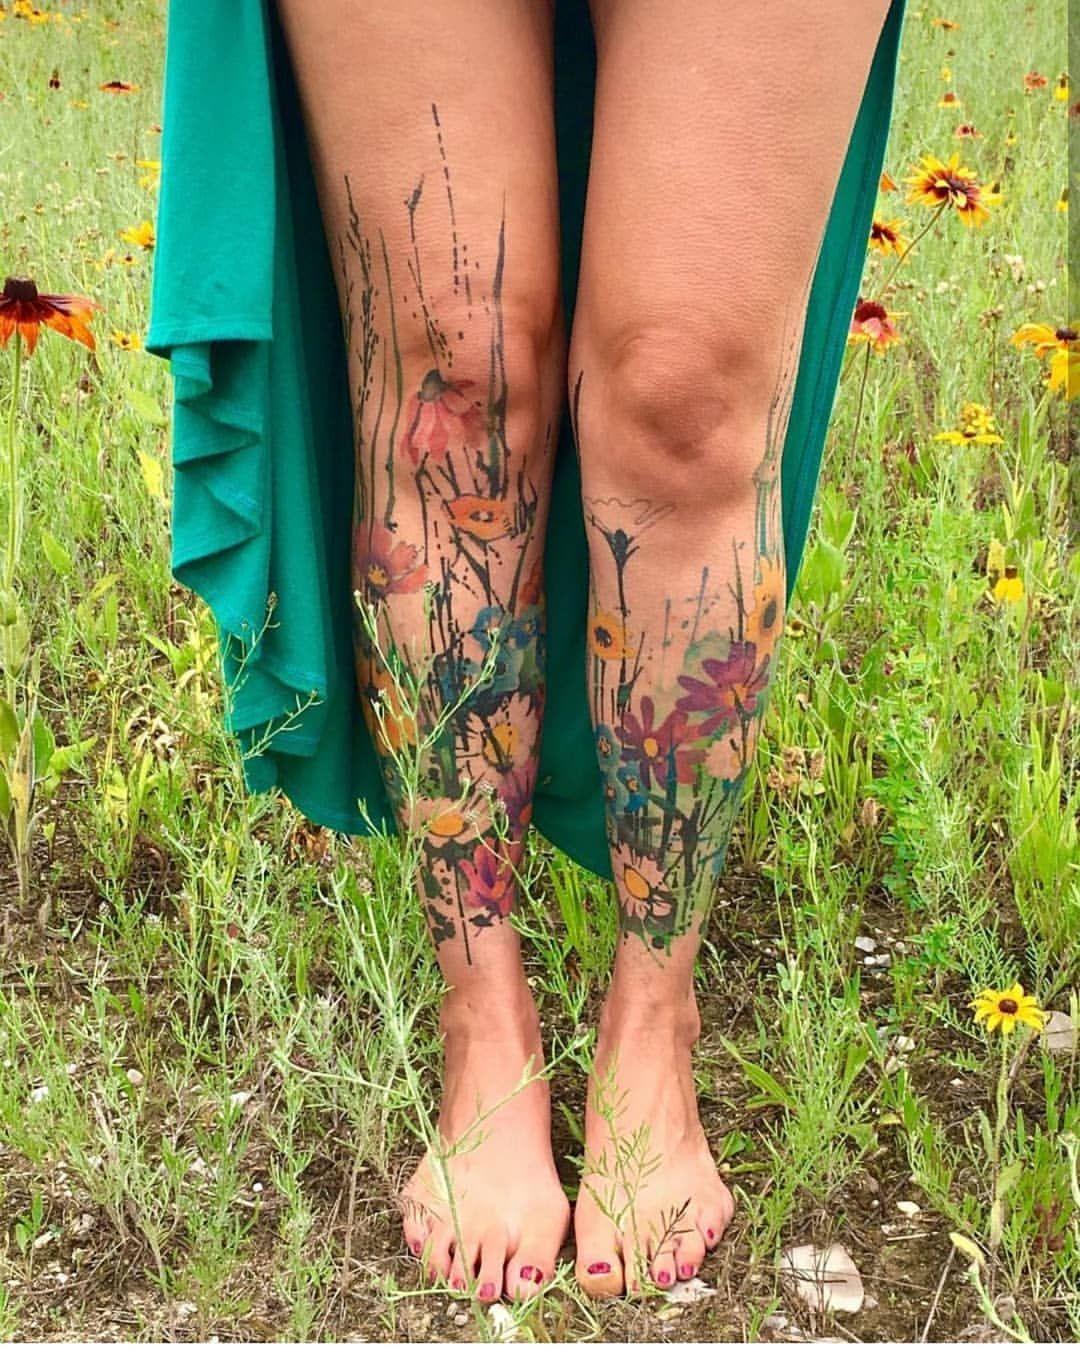 "Photo of TATTOOSELECTION on Instagram: ""Tattoo Artist @mrcoffeybean  _________________________________  #tattooselection #tattoo #tattooed #tatuaje  #tatuaggio #taty #tatoo #ink…"""